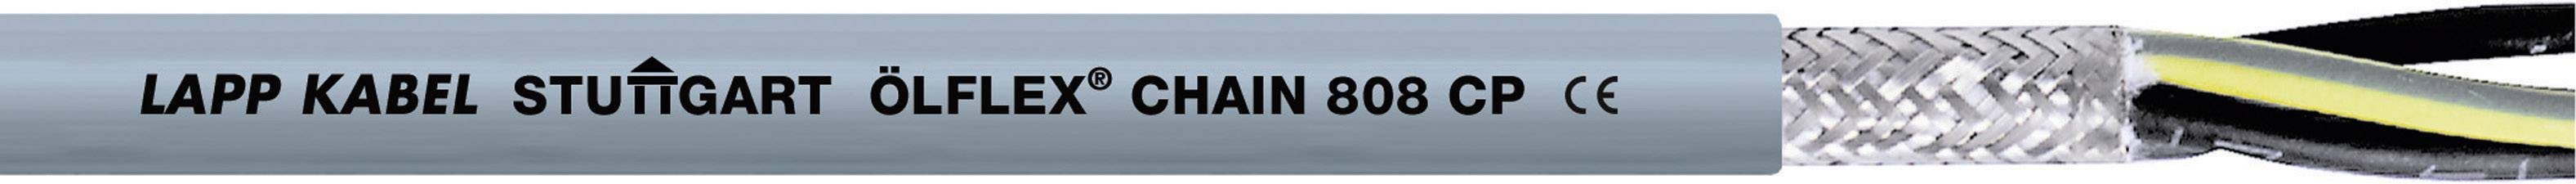 Žíla kabelu LappKabel ÖLFLEX CHAIN 808 CP 2X1,5 (1027775), 2x 1,5 mm², polyurethan, Ø 7,1 mm, stíněný, 50 m, š